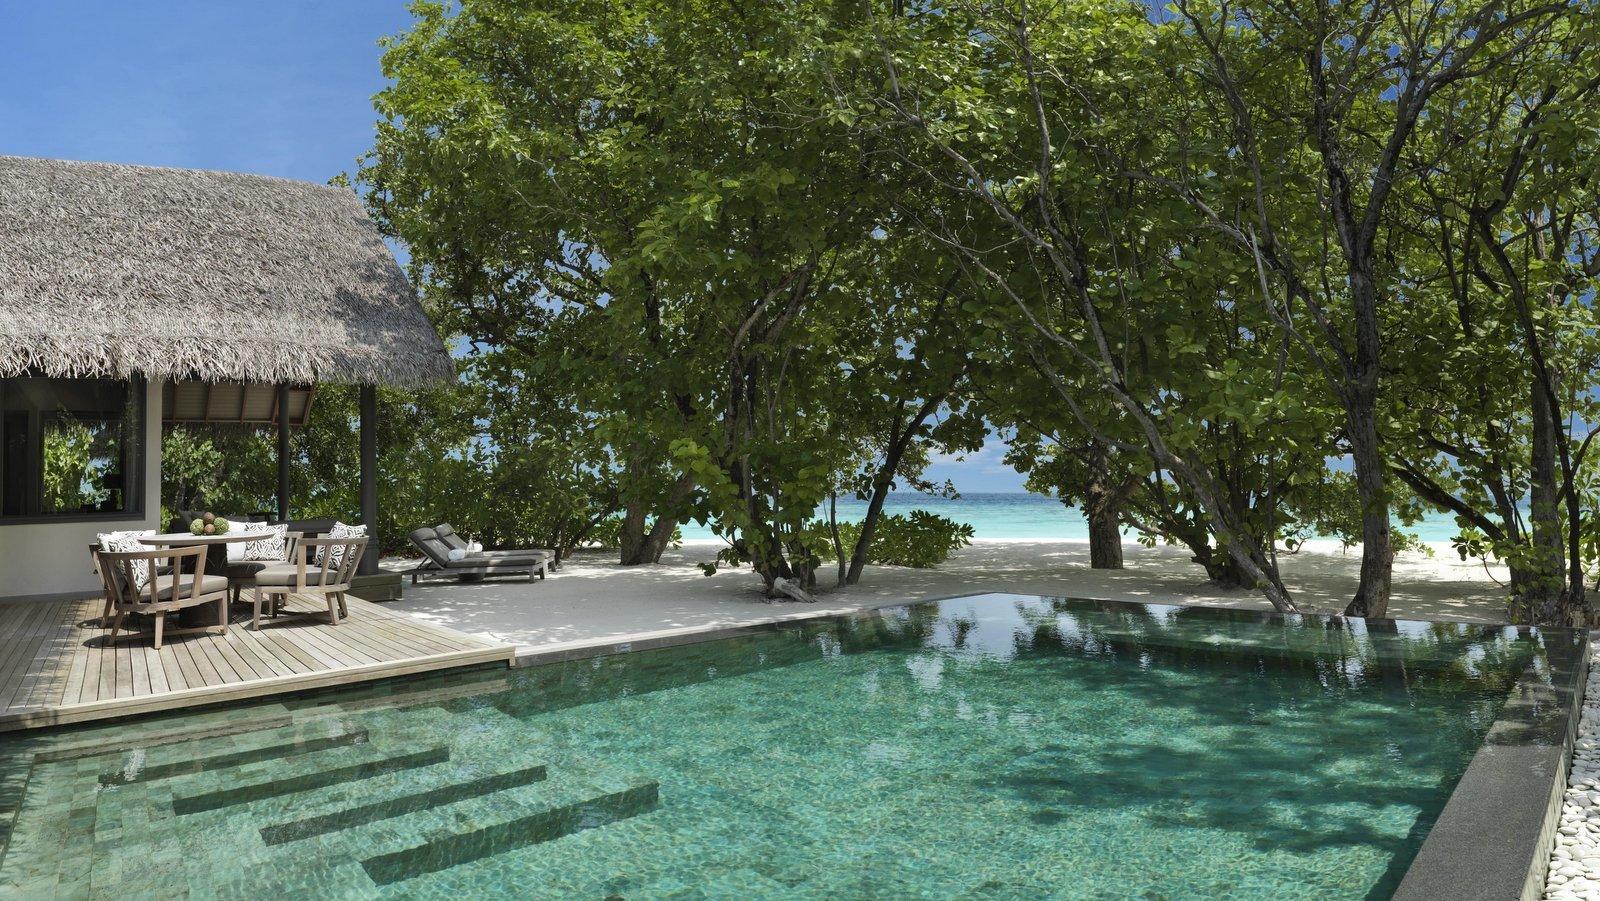 Мальдивы, отель Vakkaru Maldives, номер Deluxe Beach Pool Residence